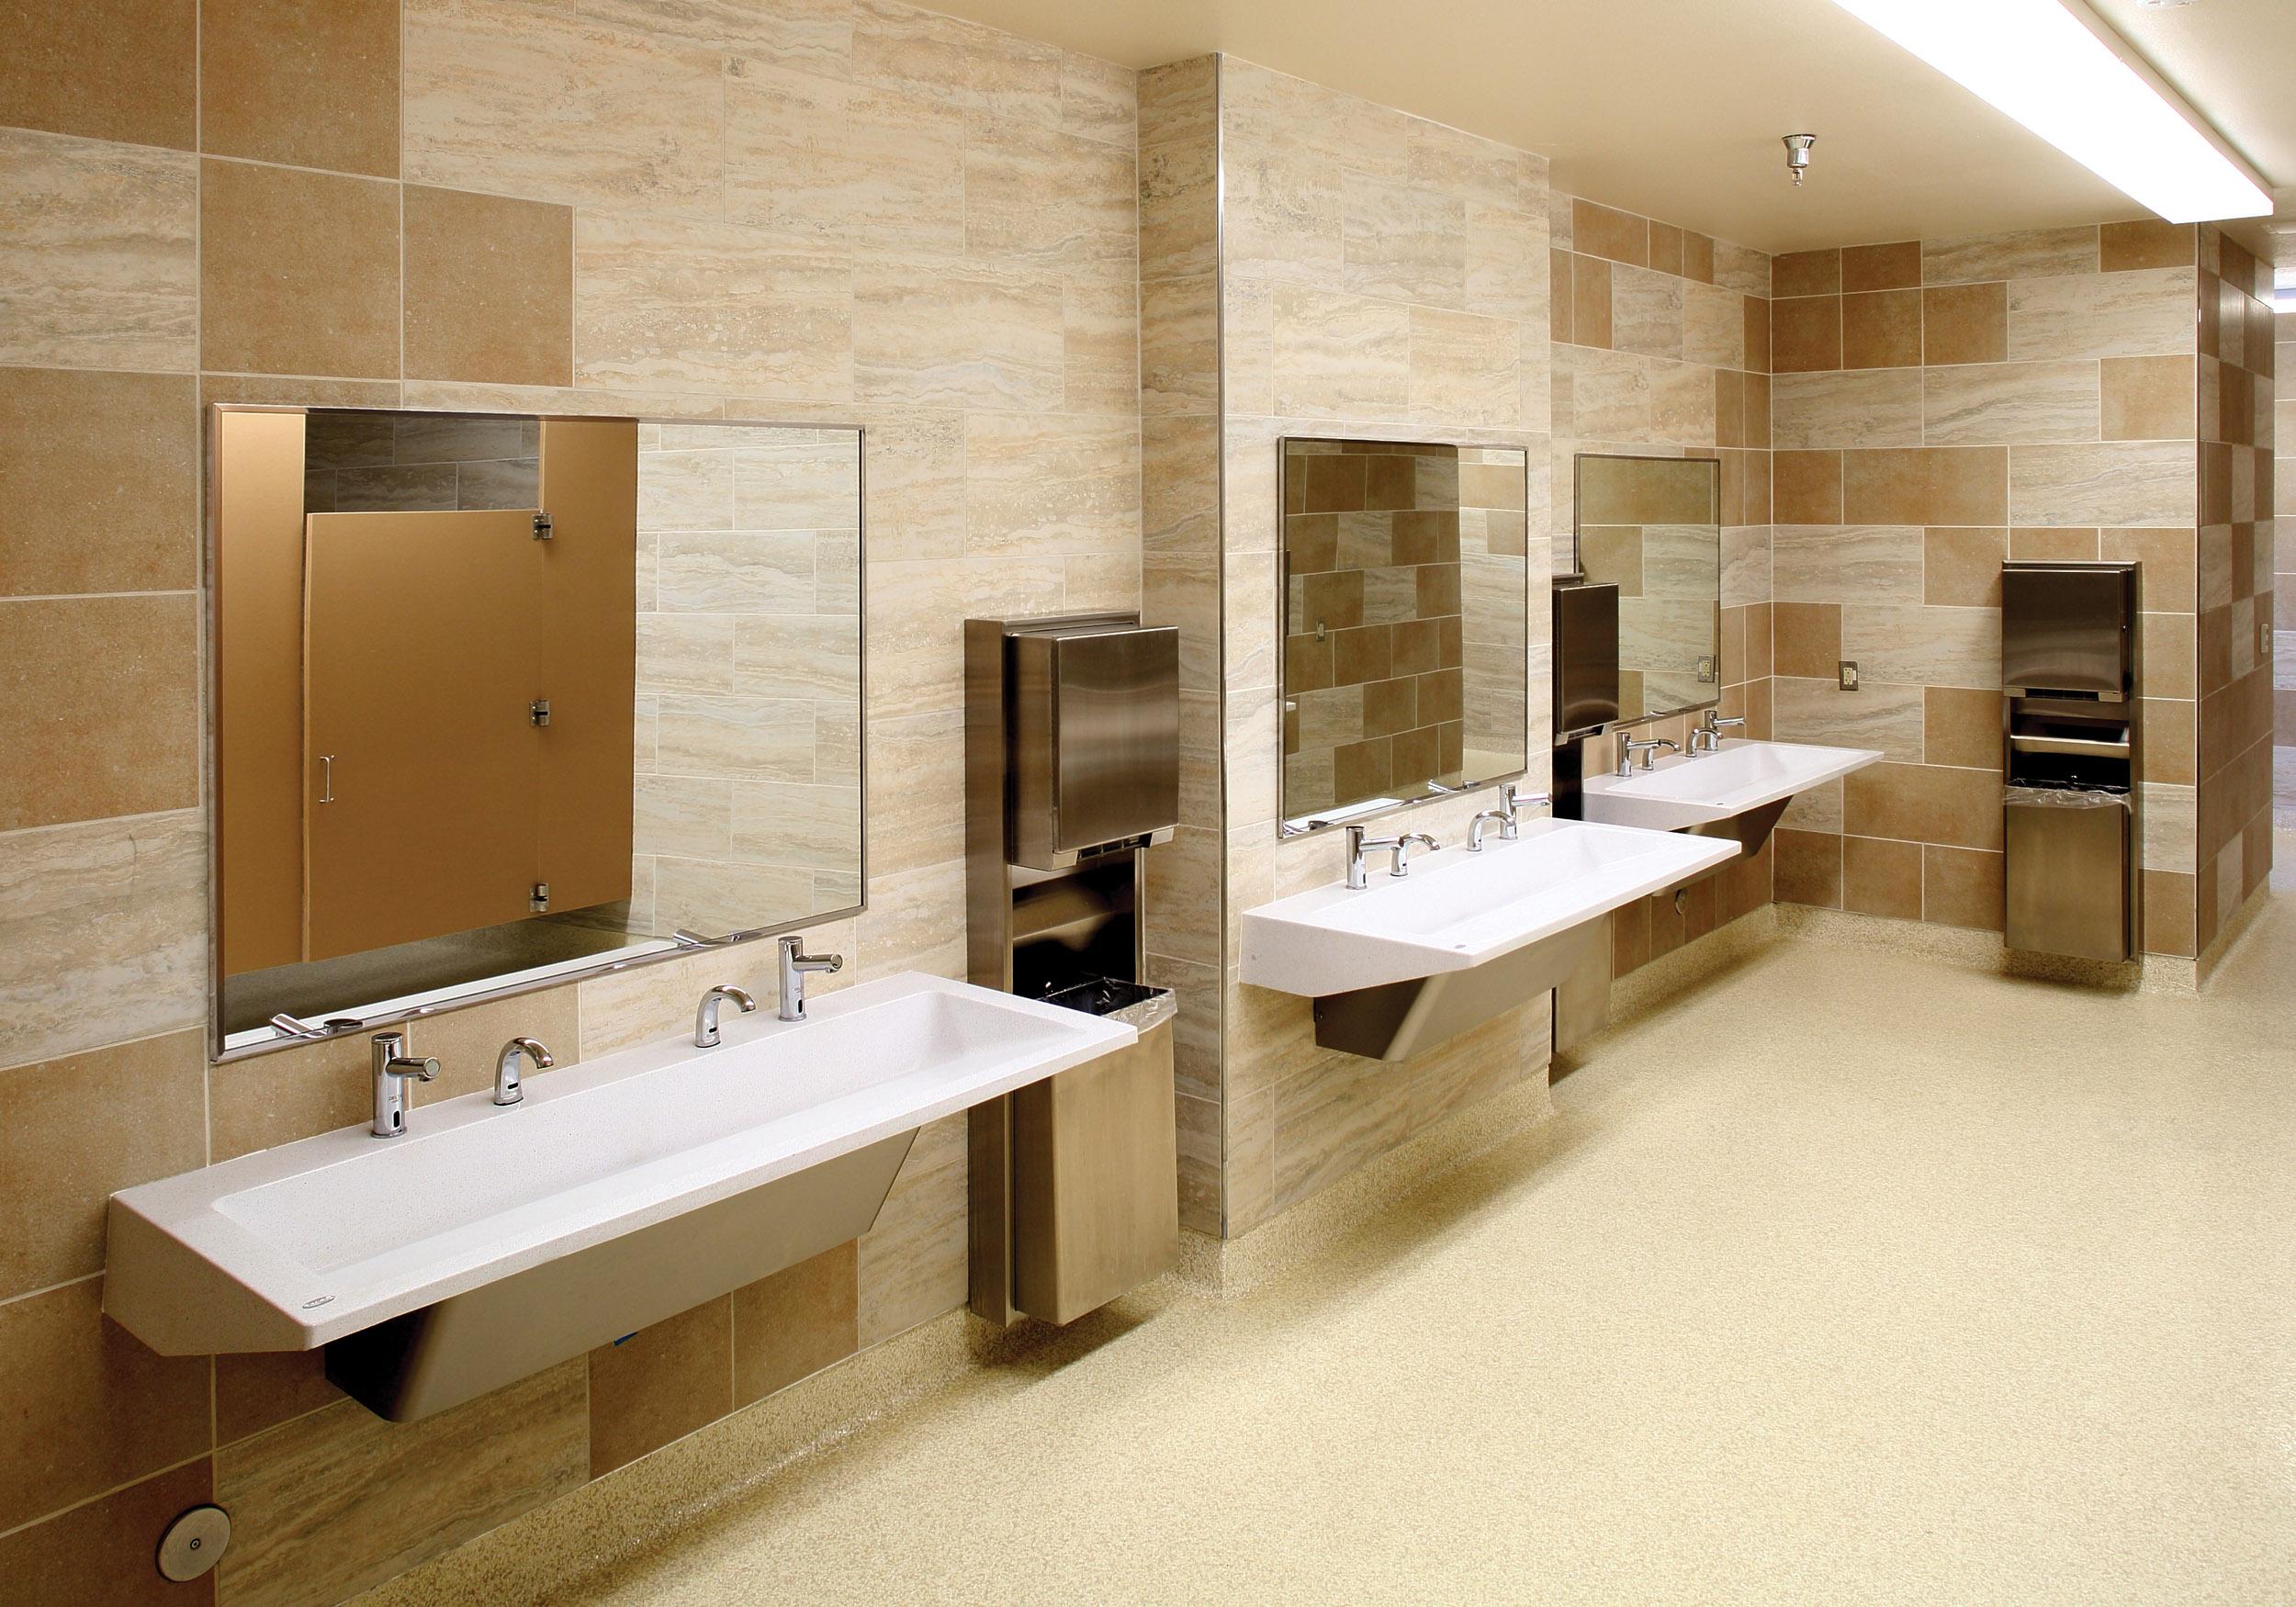 bradley bathroom. Restroom Featuring A 3 Station R-Series Verge Lavatory System Bradley Bathroom